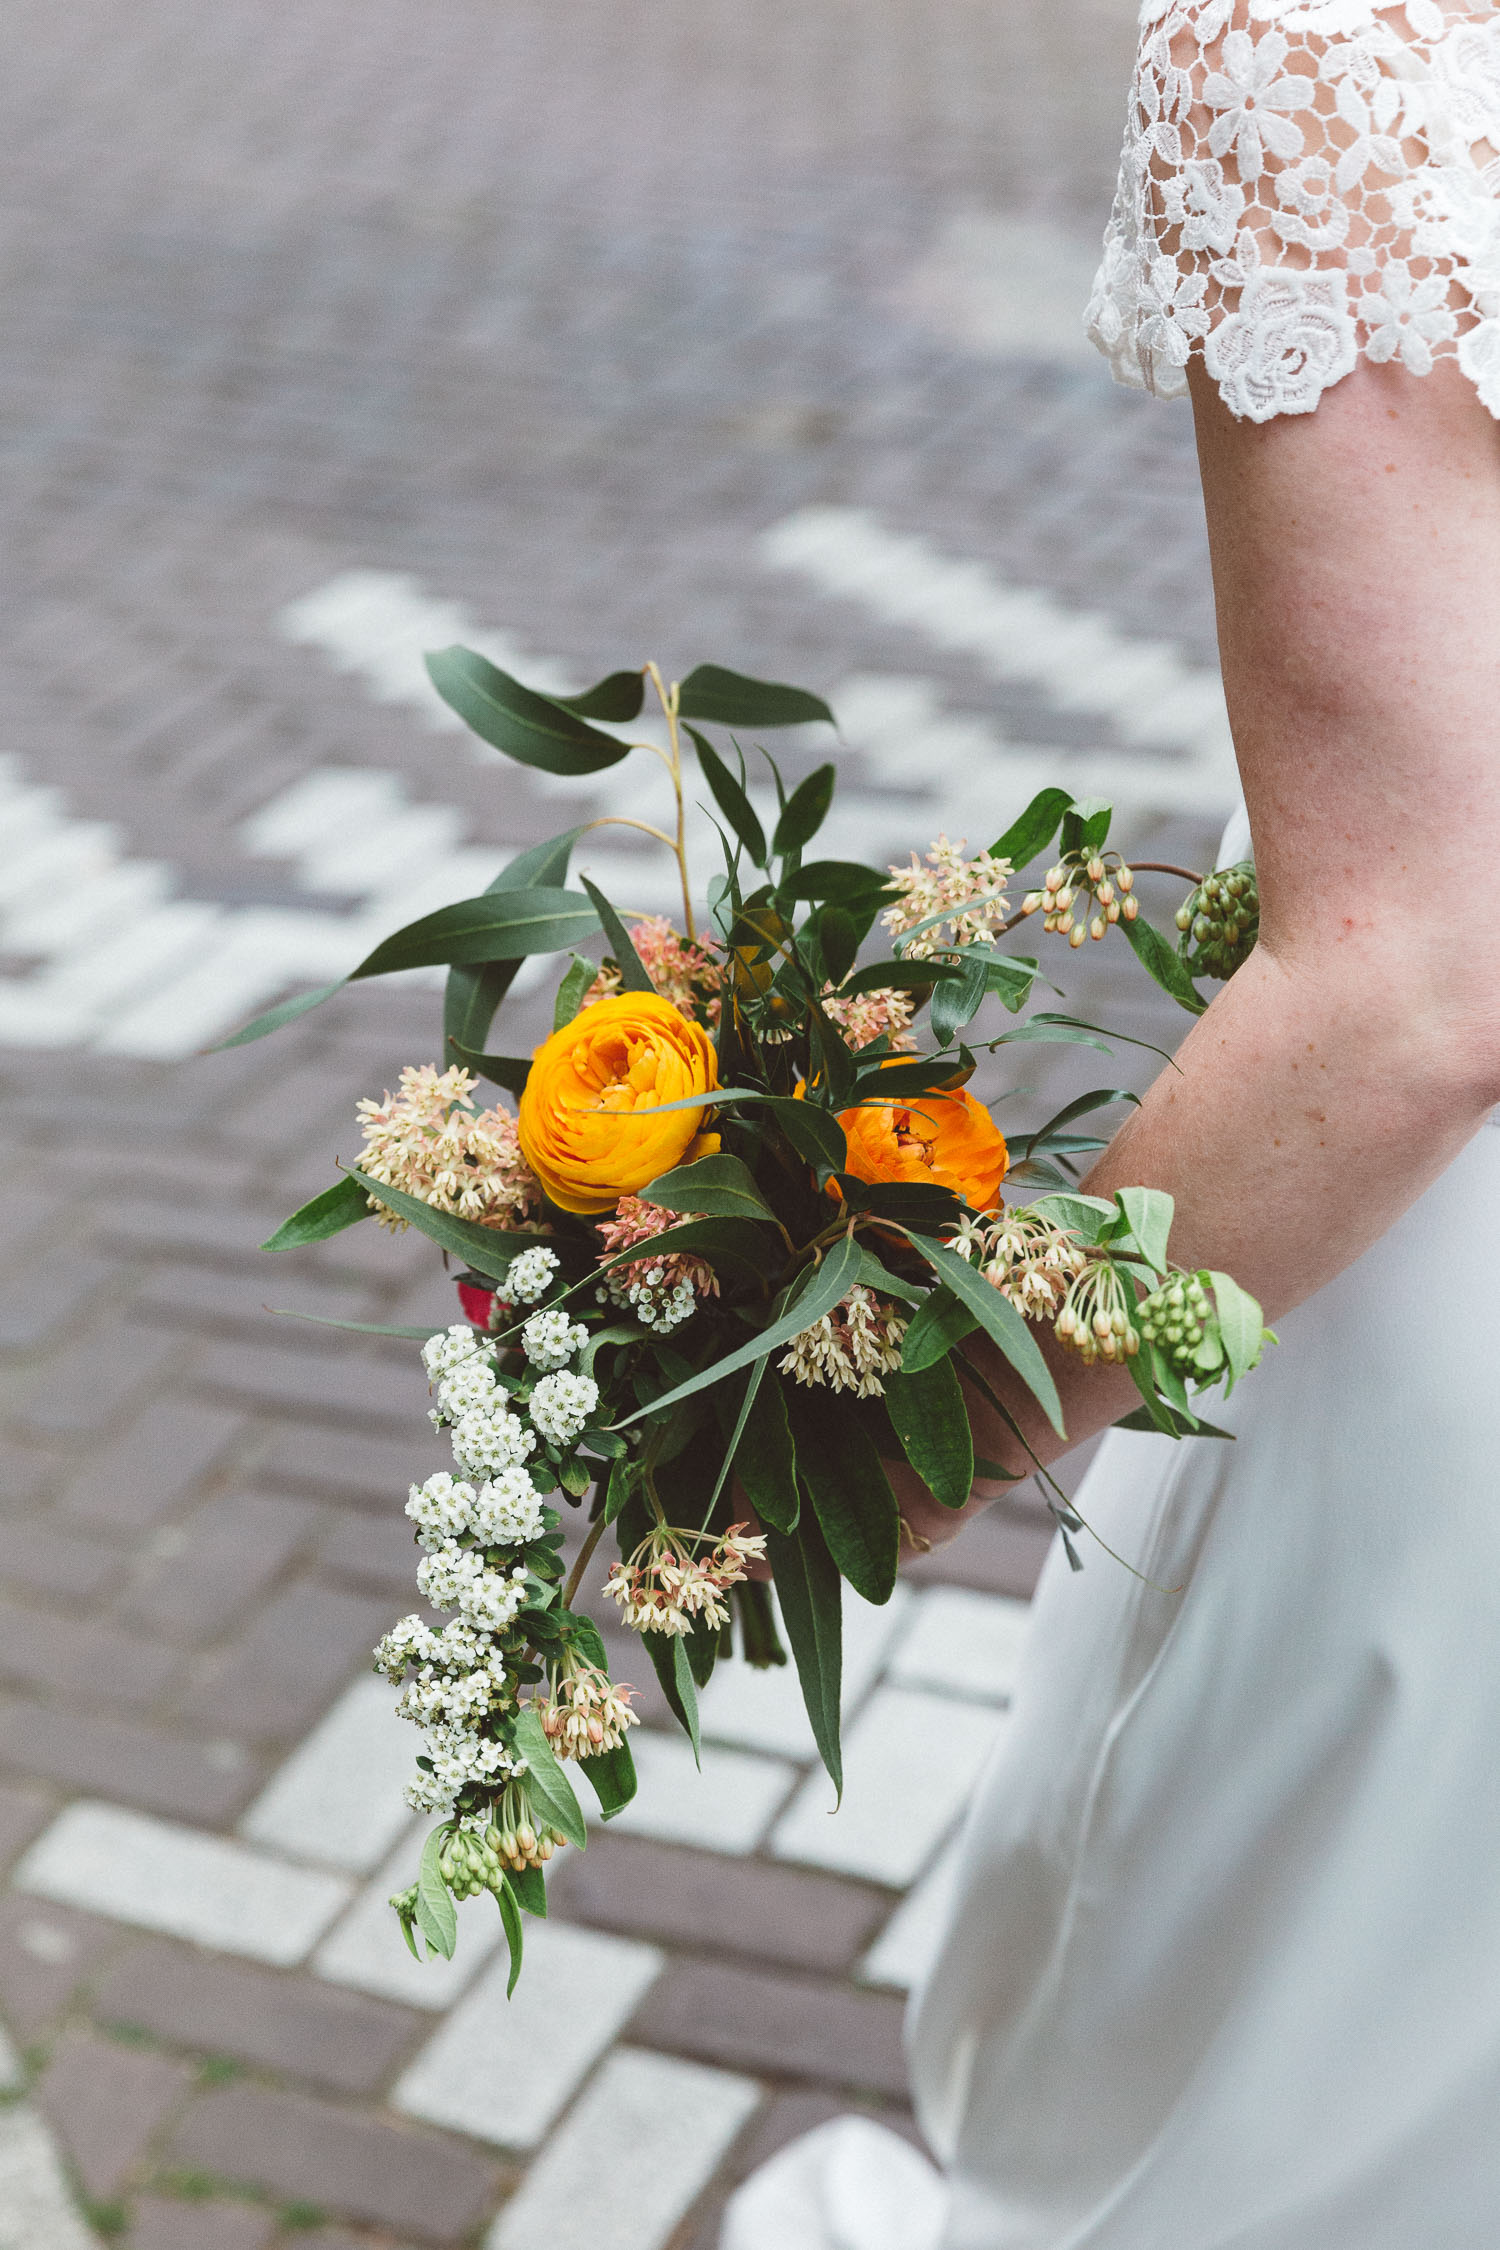 Backyard-wedding-Bruiloft-Annemiek-David-fotografie-photography-On-a-hazy-morning-Amsterdam-The-Netherlands114.jpg